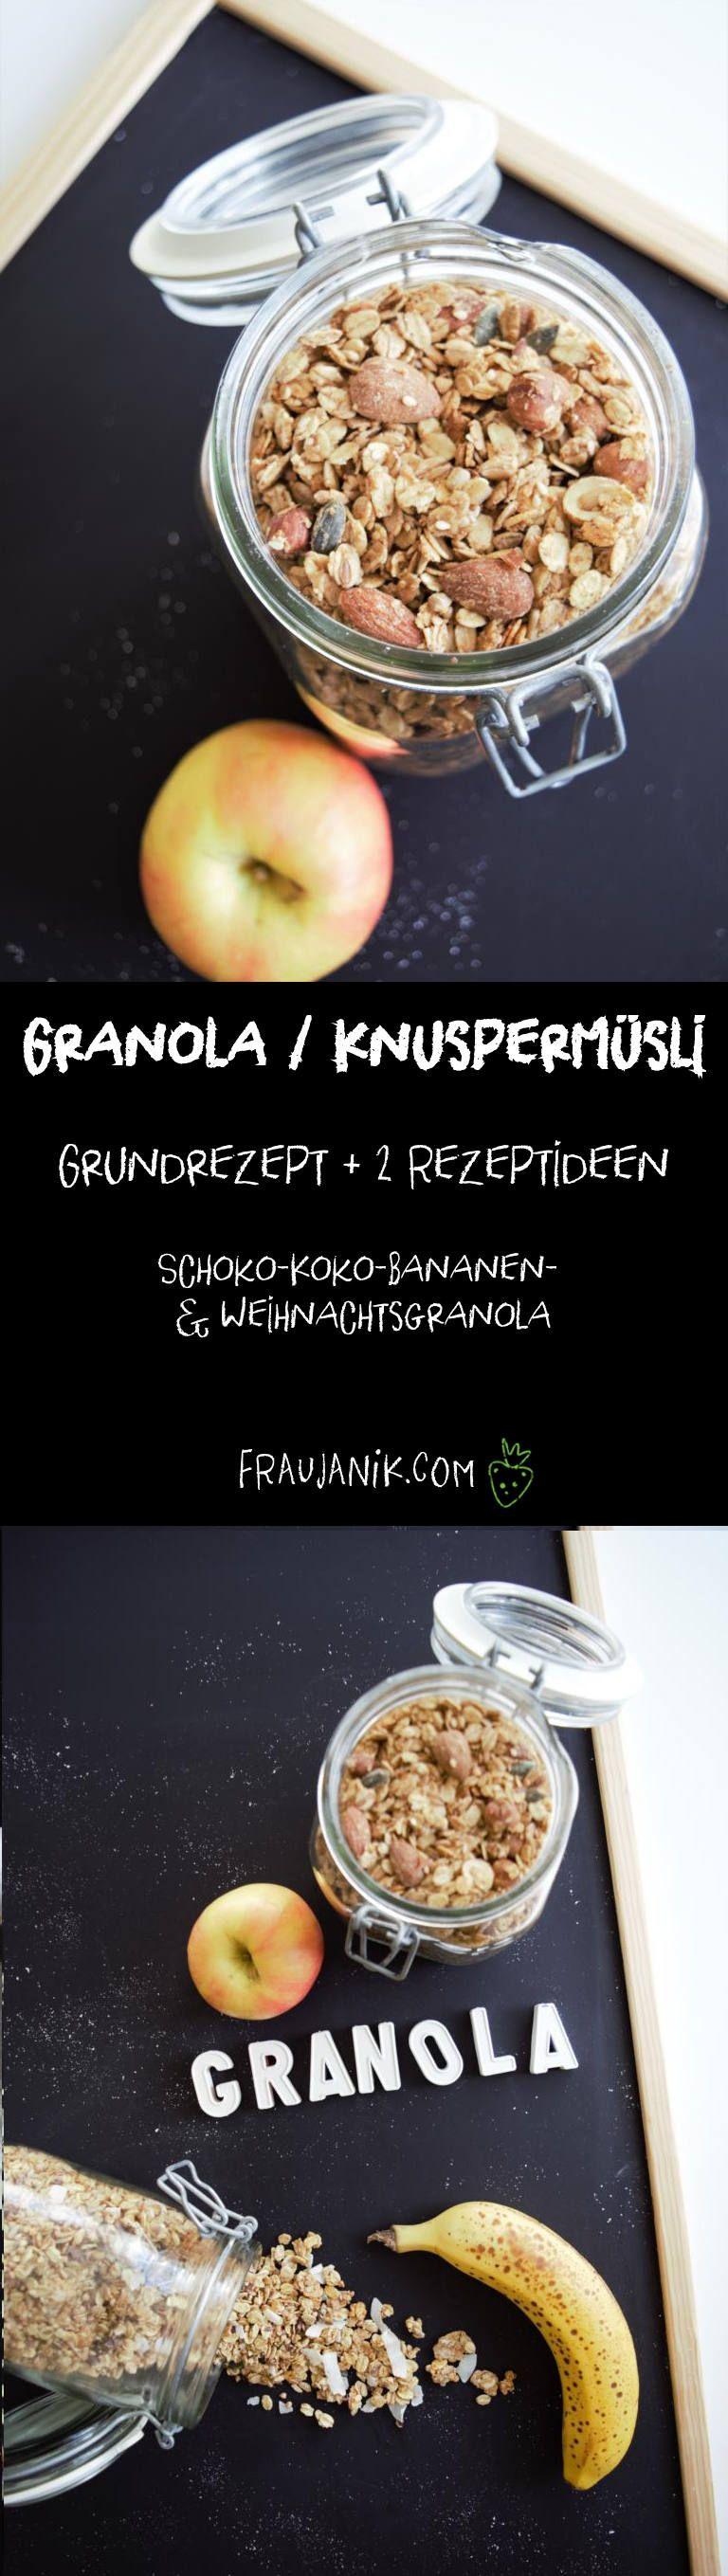 granola knusperm sli selber machen meine gesunden rezepte frau janik pinterest m sli. Black Bedroom Furniture Sets. Home Design Ideas